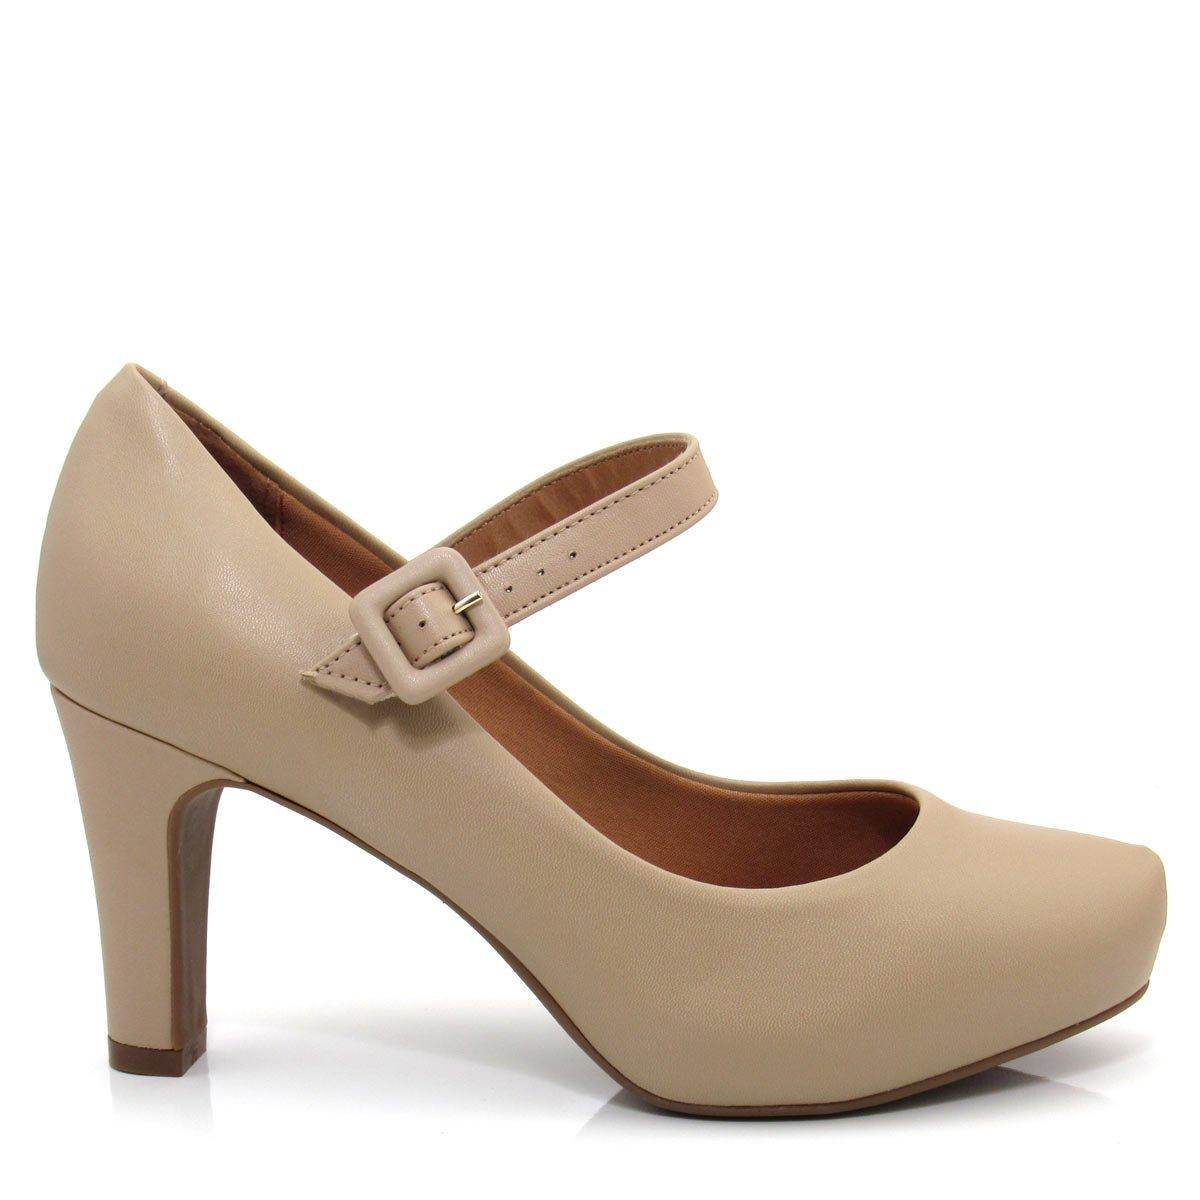 5742d5f2d Sapato Bebê Bisuzinho Feminino Bege Sapato Bebê Boneca Bege: Sapato Scarpin  Feminino Bico Redondo Vizzano 1840103